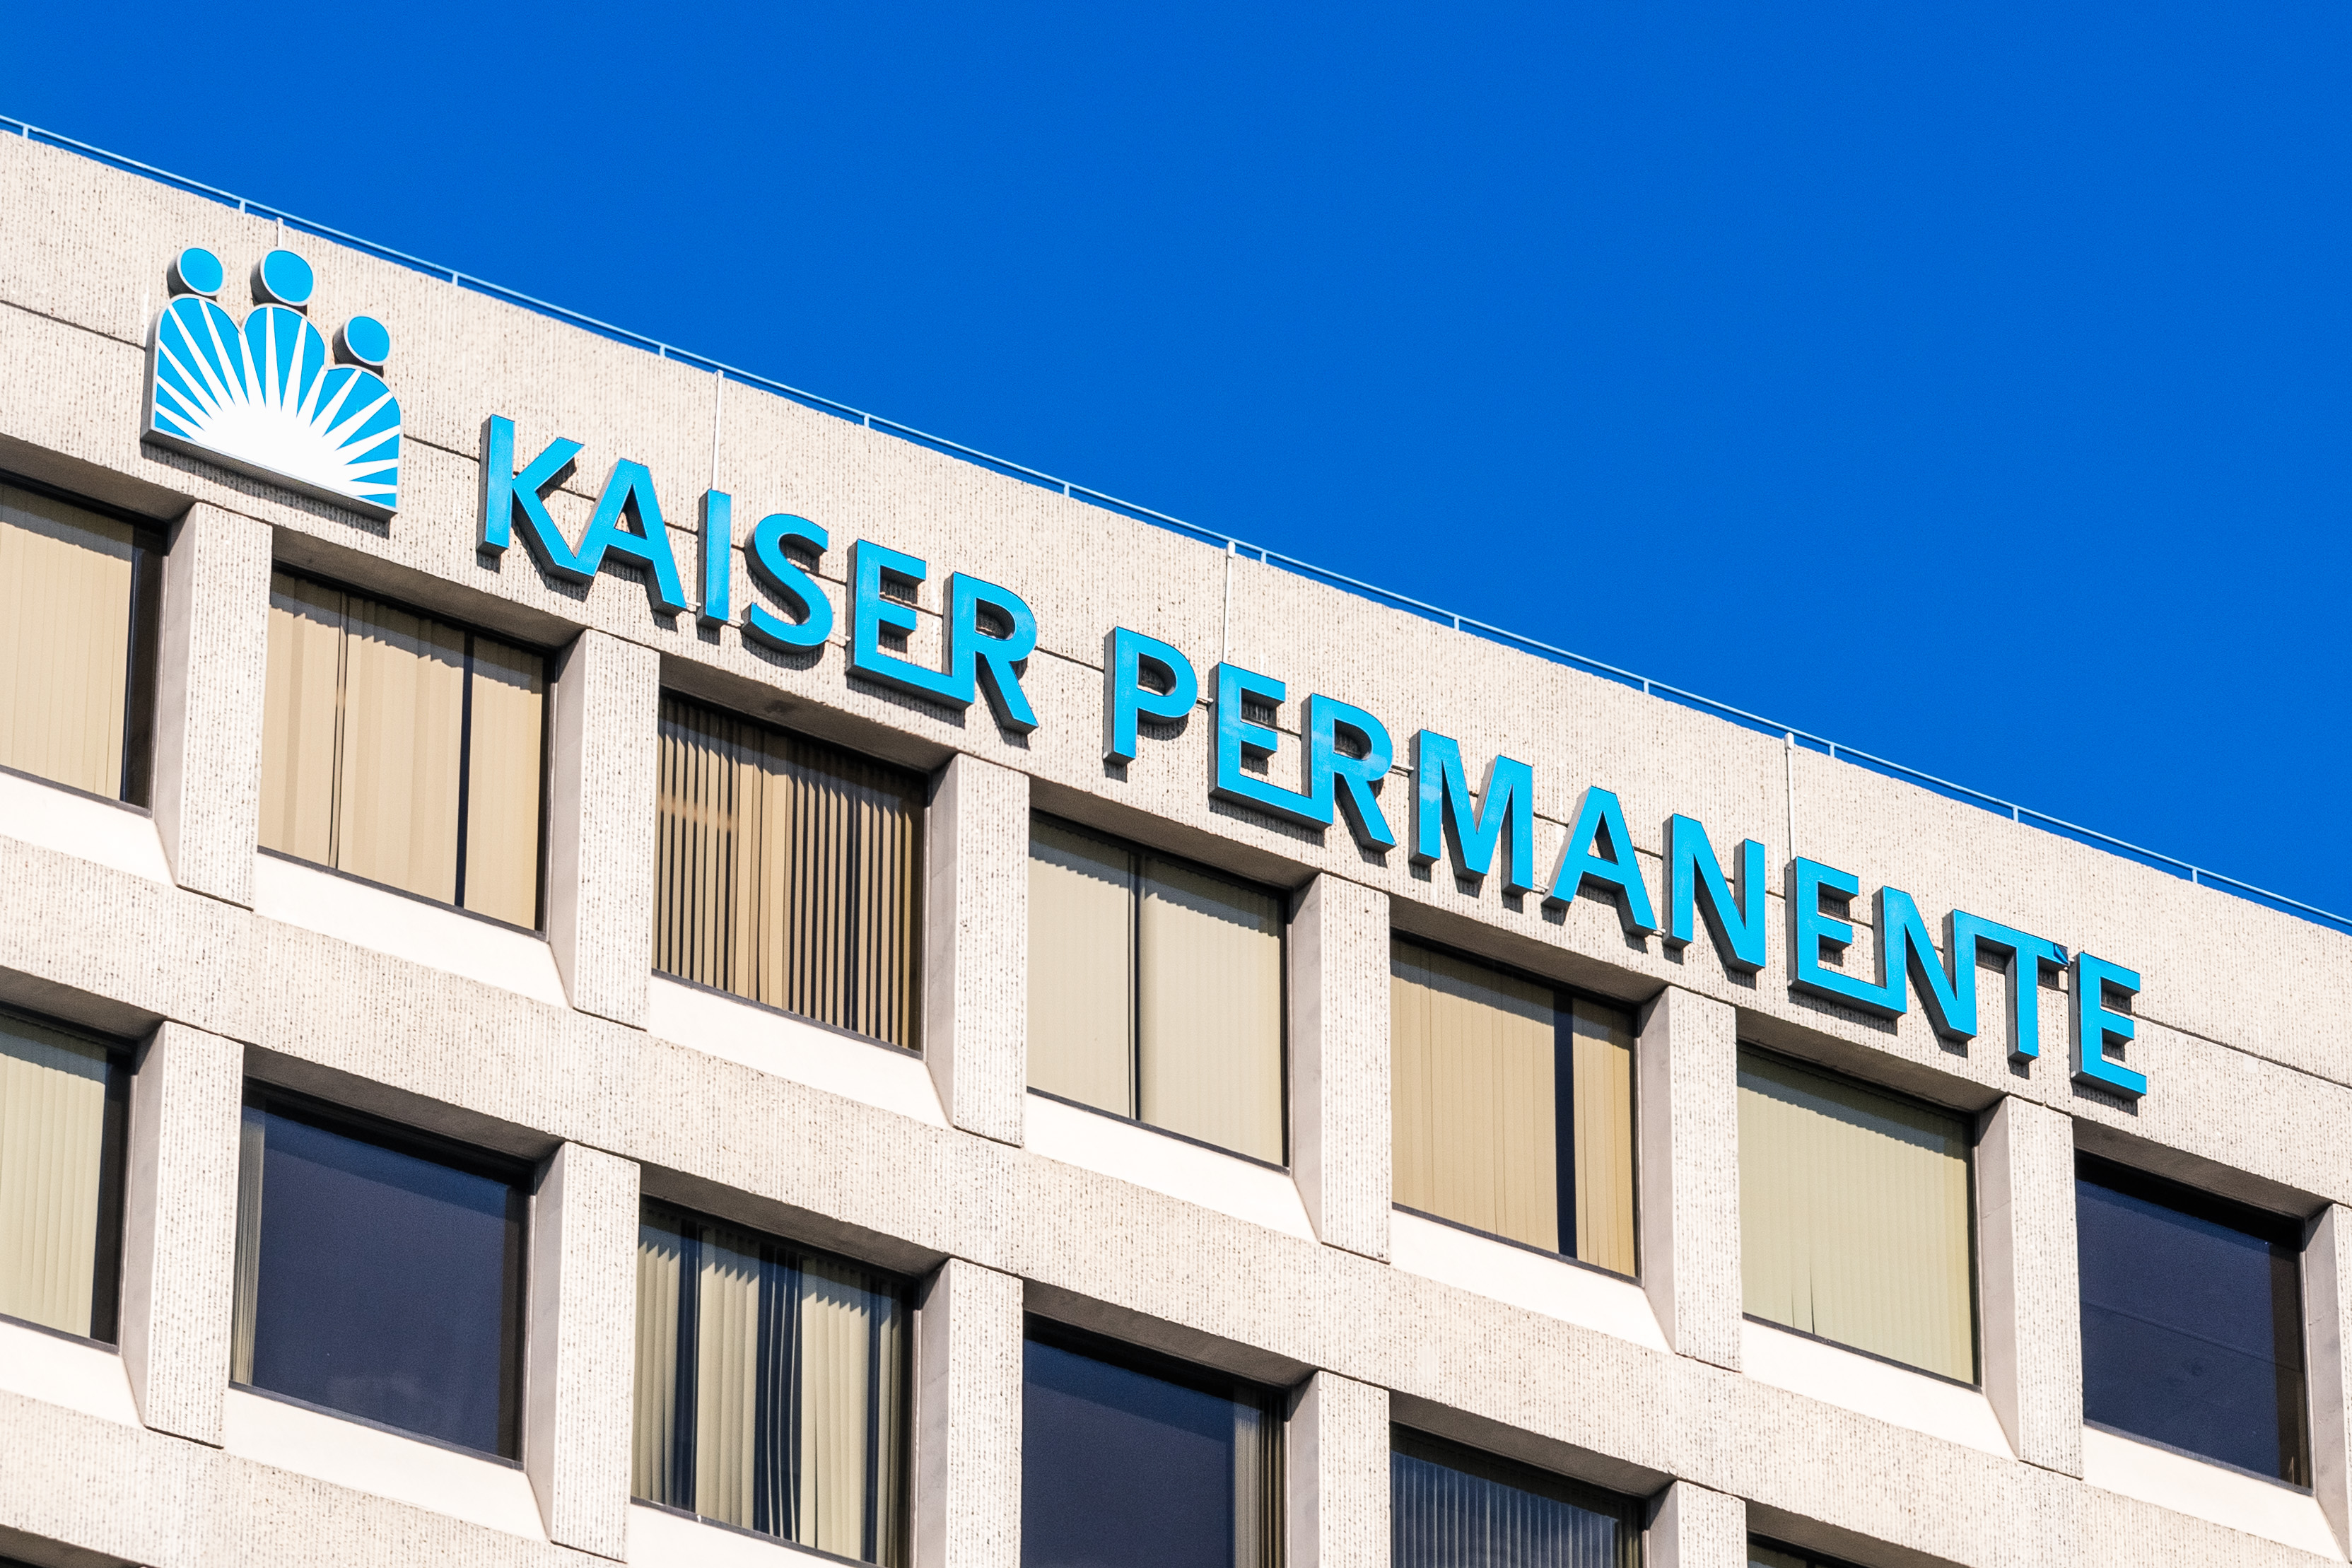 Kaiser Permanente posts $ 3 billion in second-quarter earnings as health plan membership increases